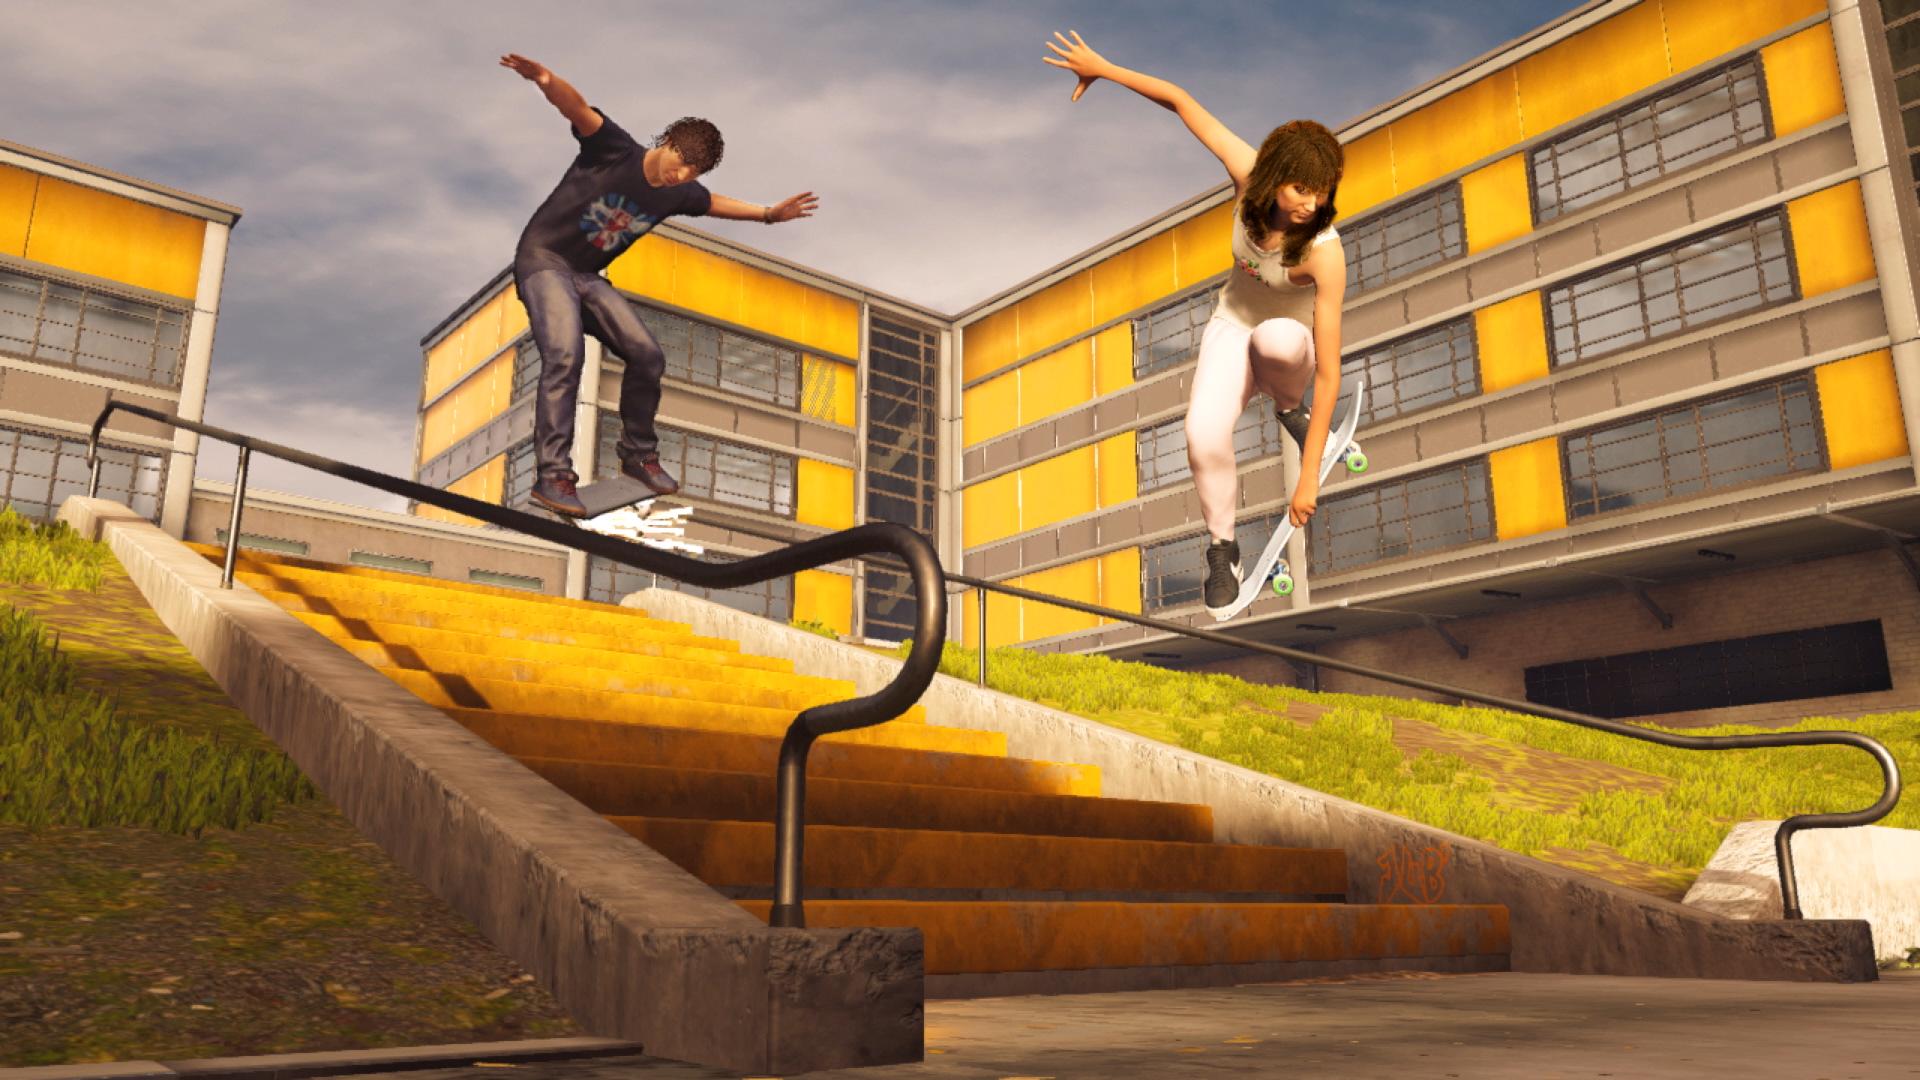 Tony Hawk's Pro Skater 1 and 2 switch